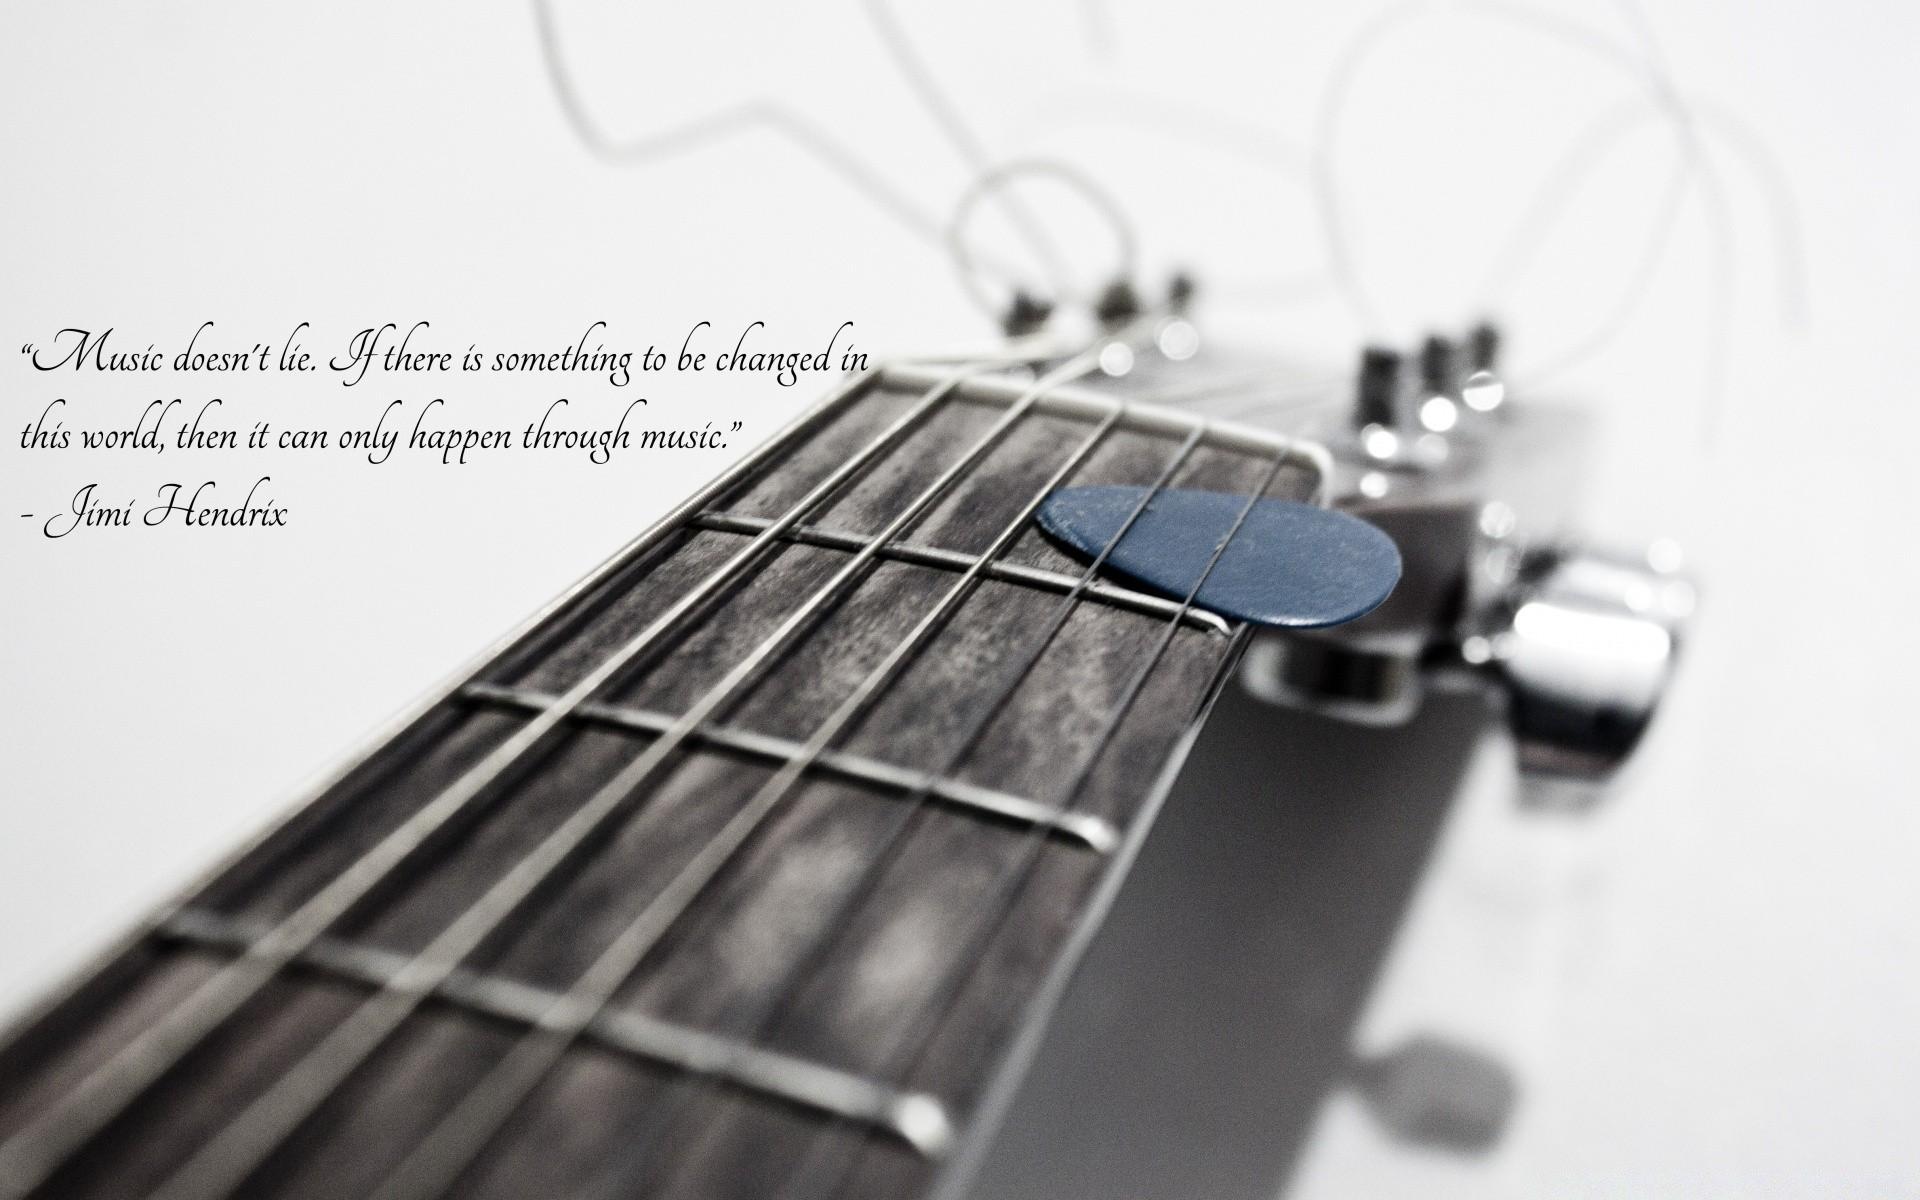 Top Wallpaper Music Desktop - 494114096442803  Best Photo Reference_752793.jpg